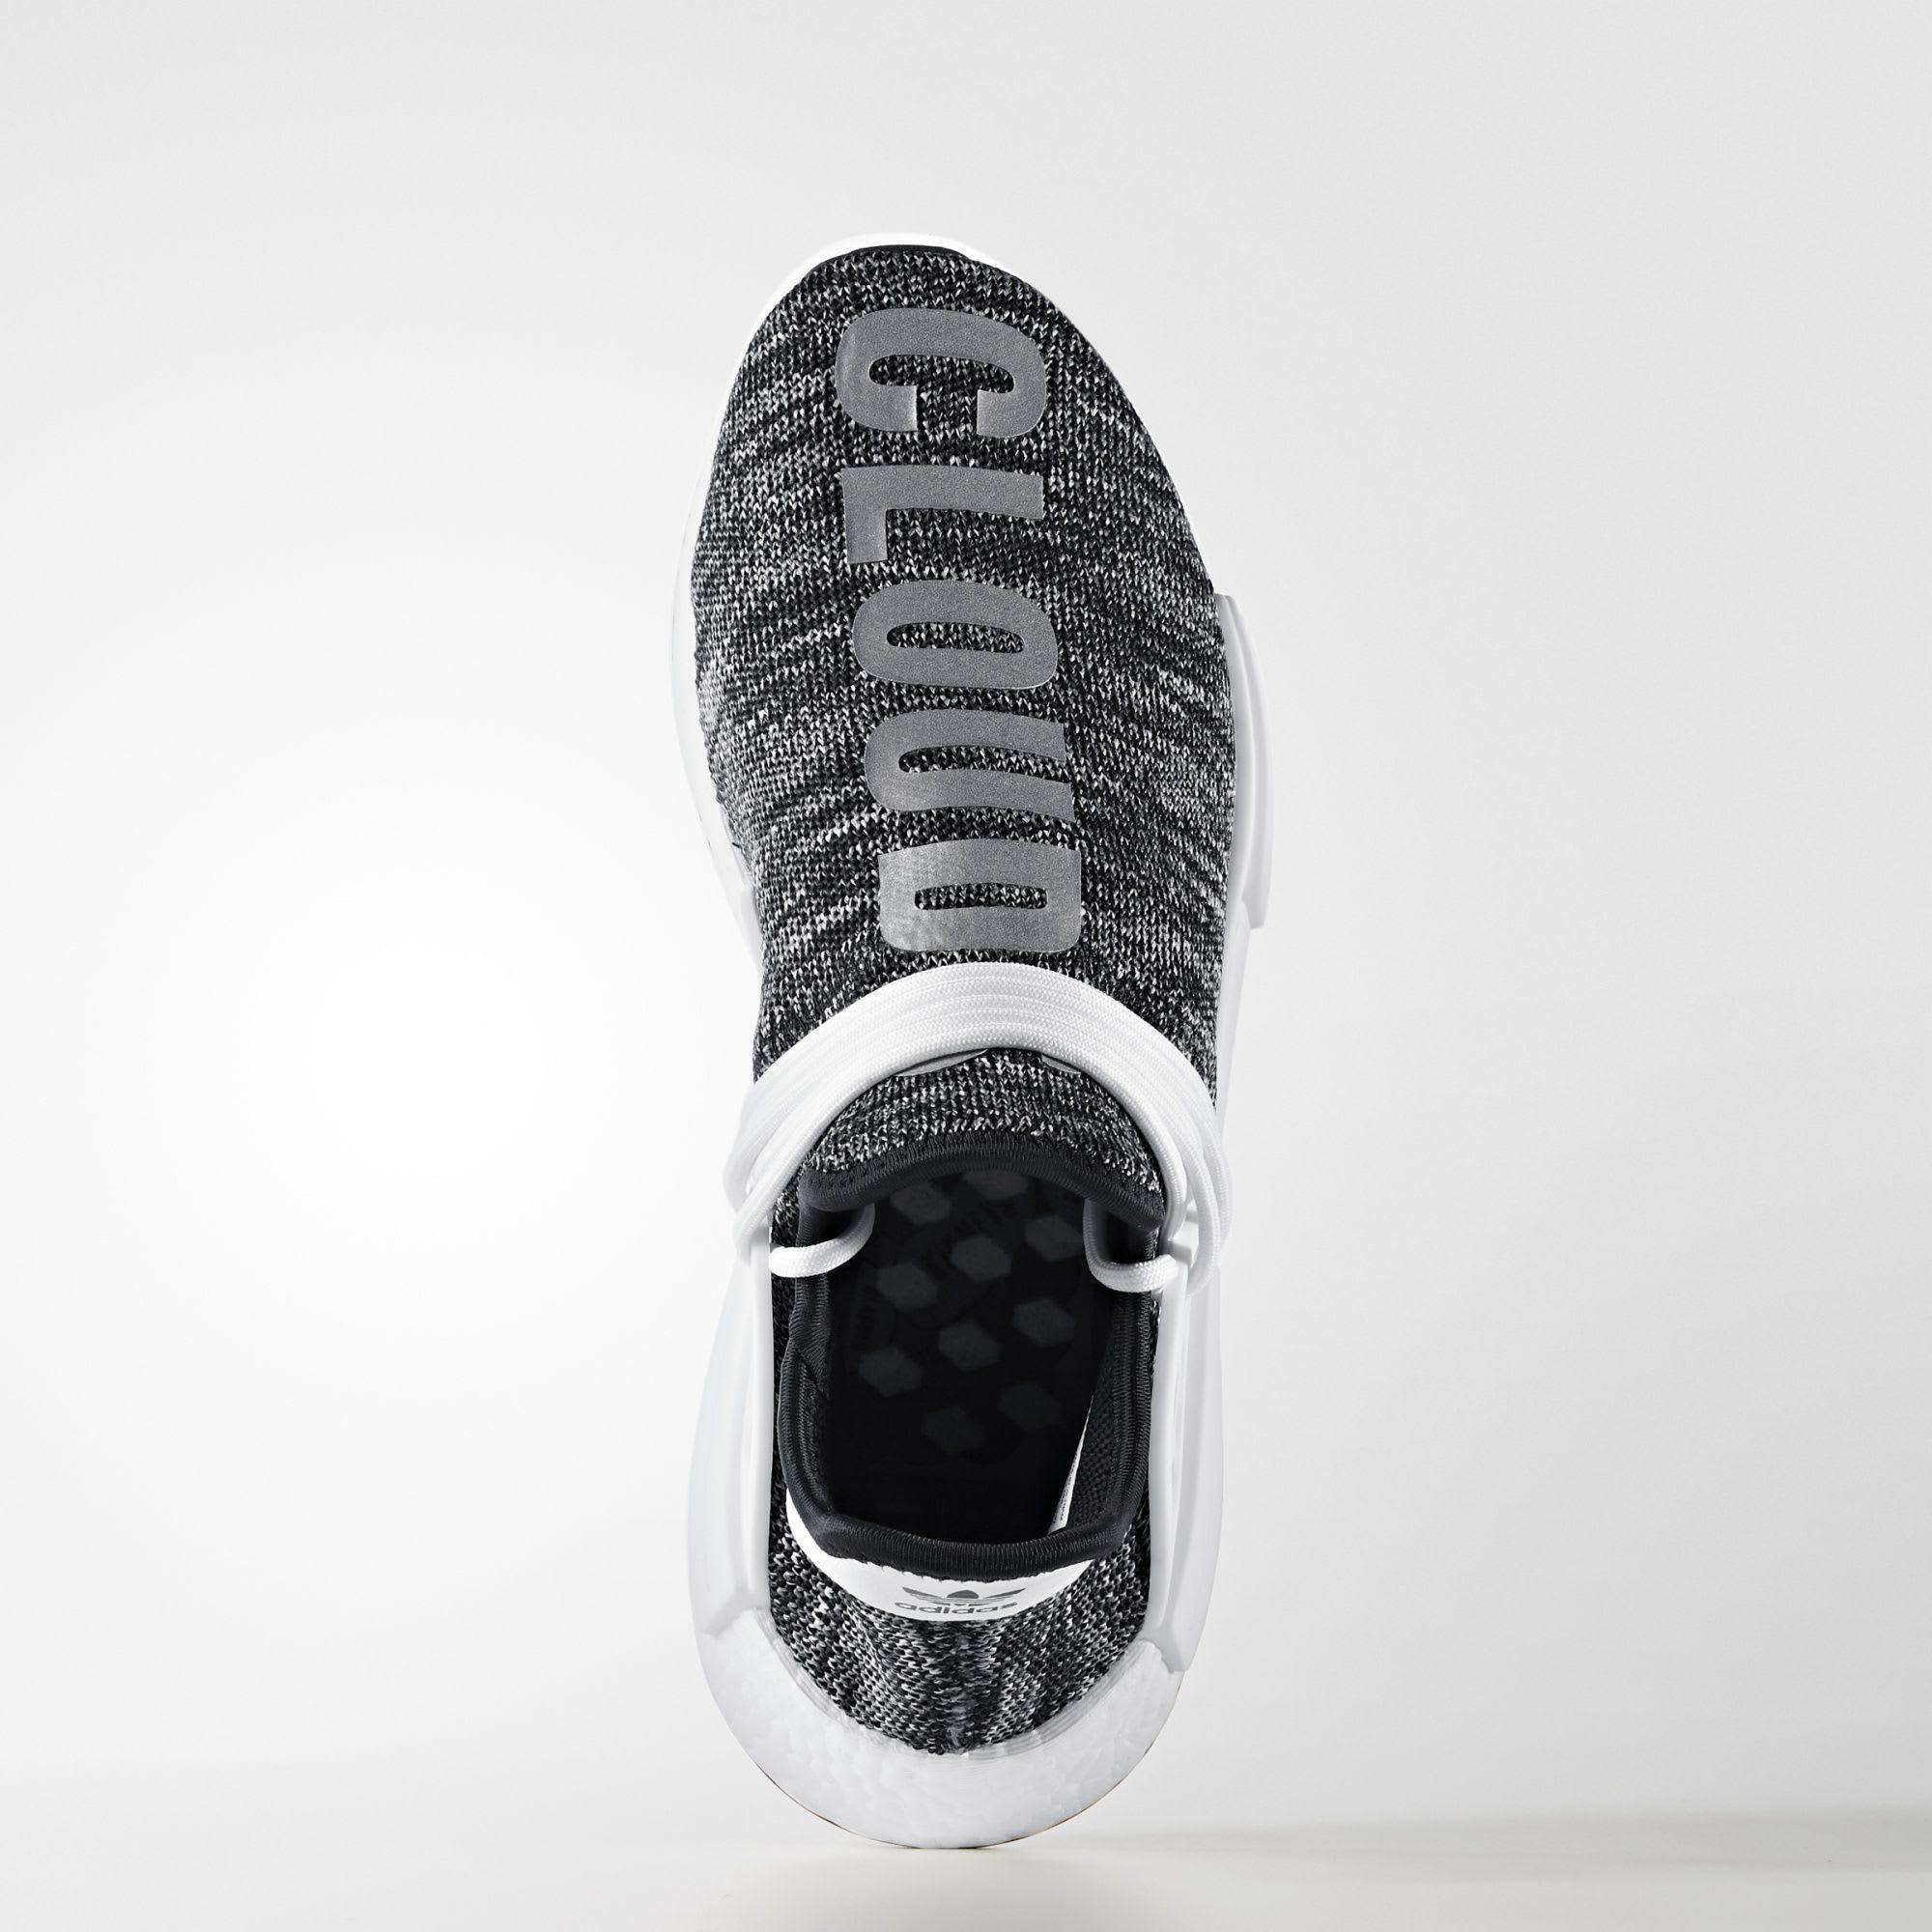 2e55d6151 Pharrell x adidas NMD Hu Trail Collection ADDICT Miami